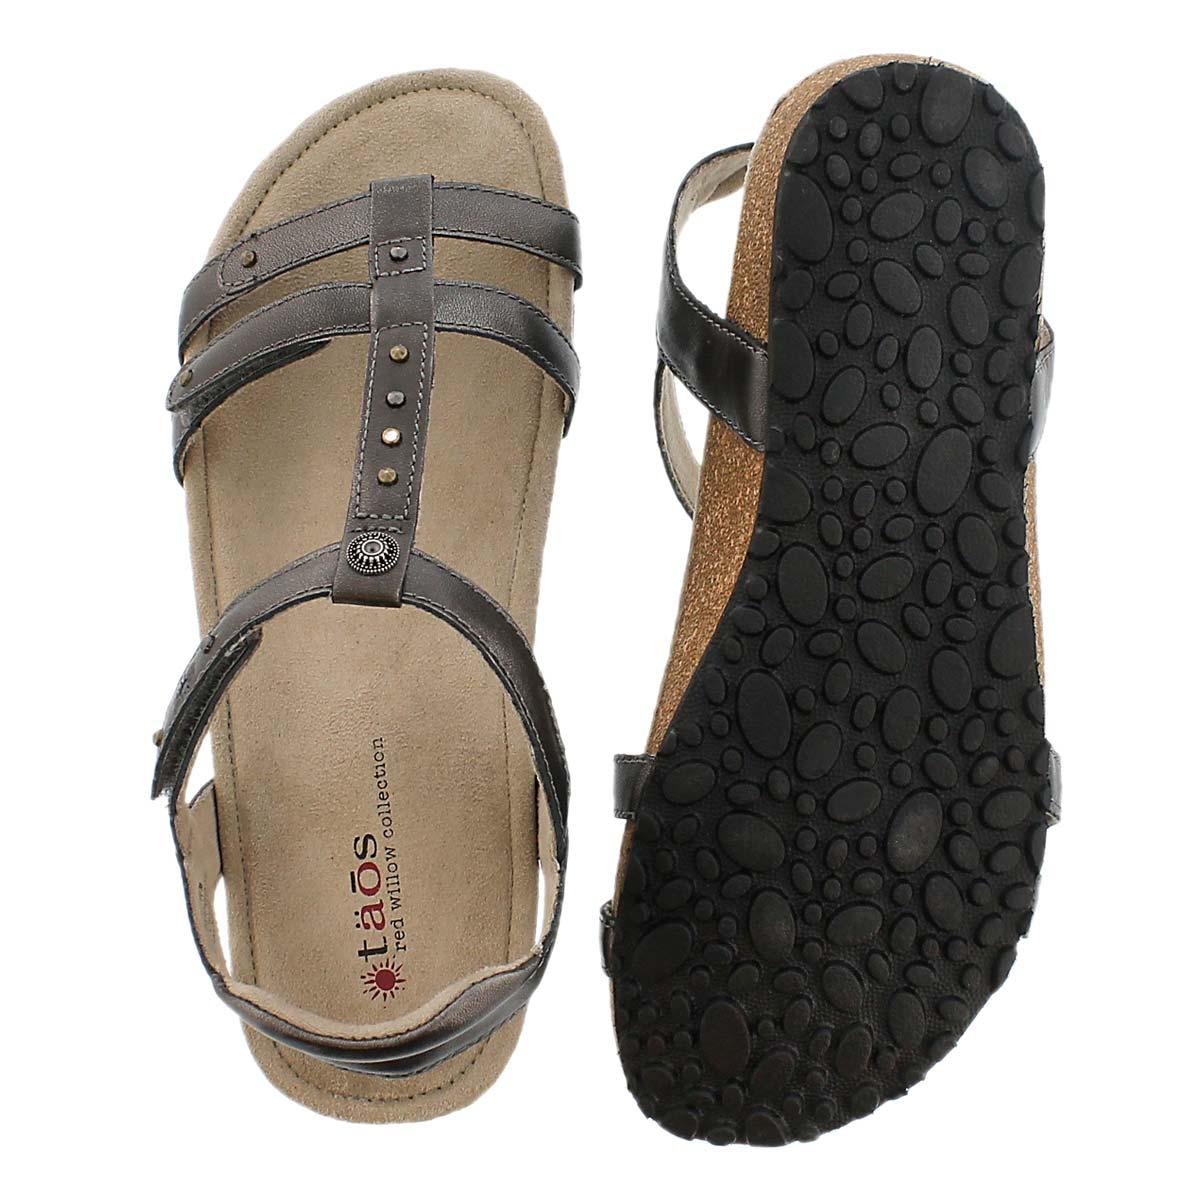 LdsThelma pewter t-strap wdg sandal